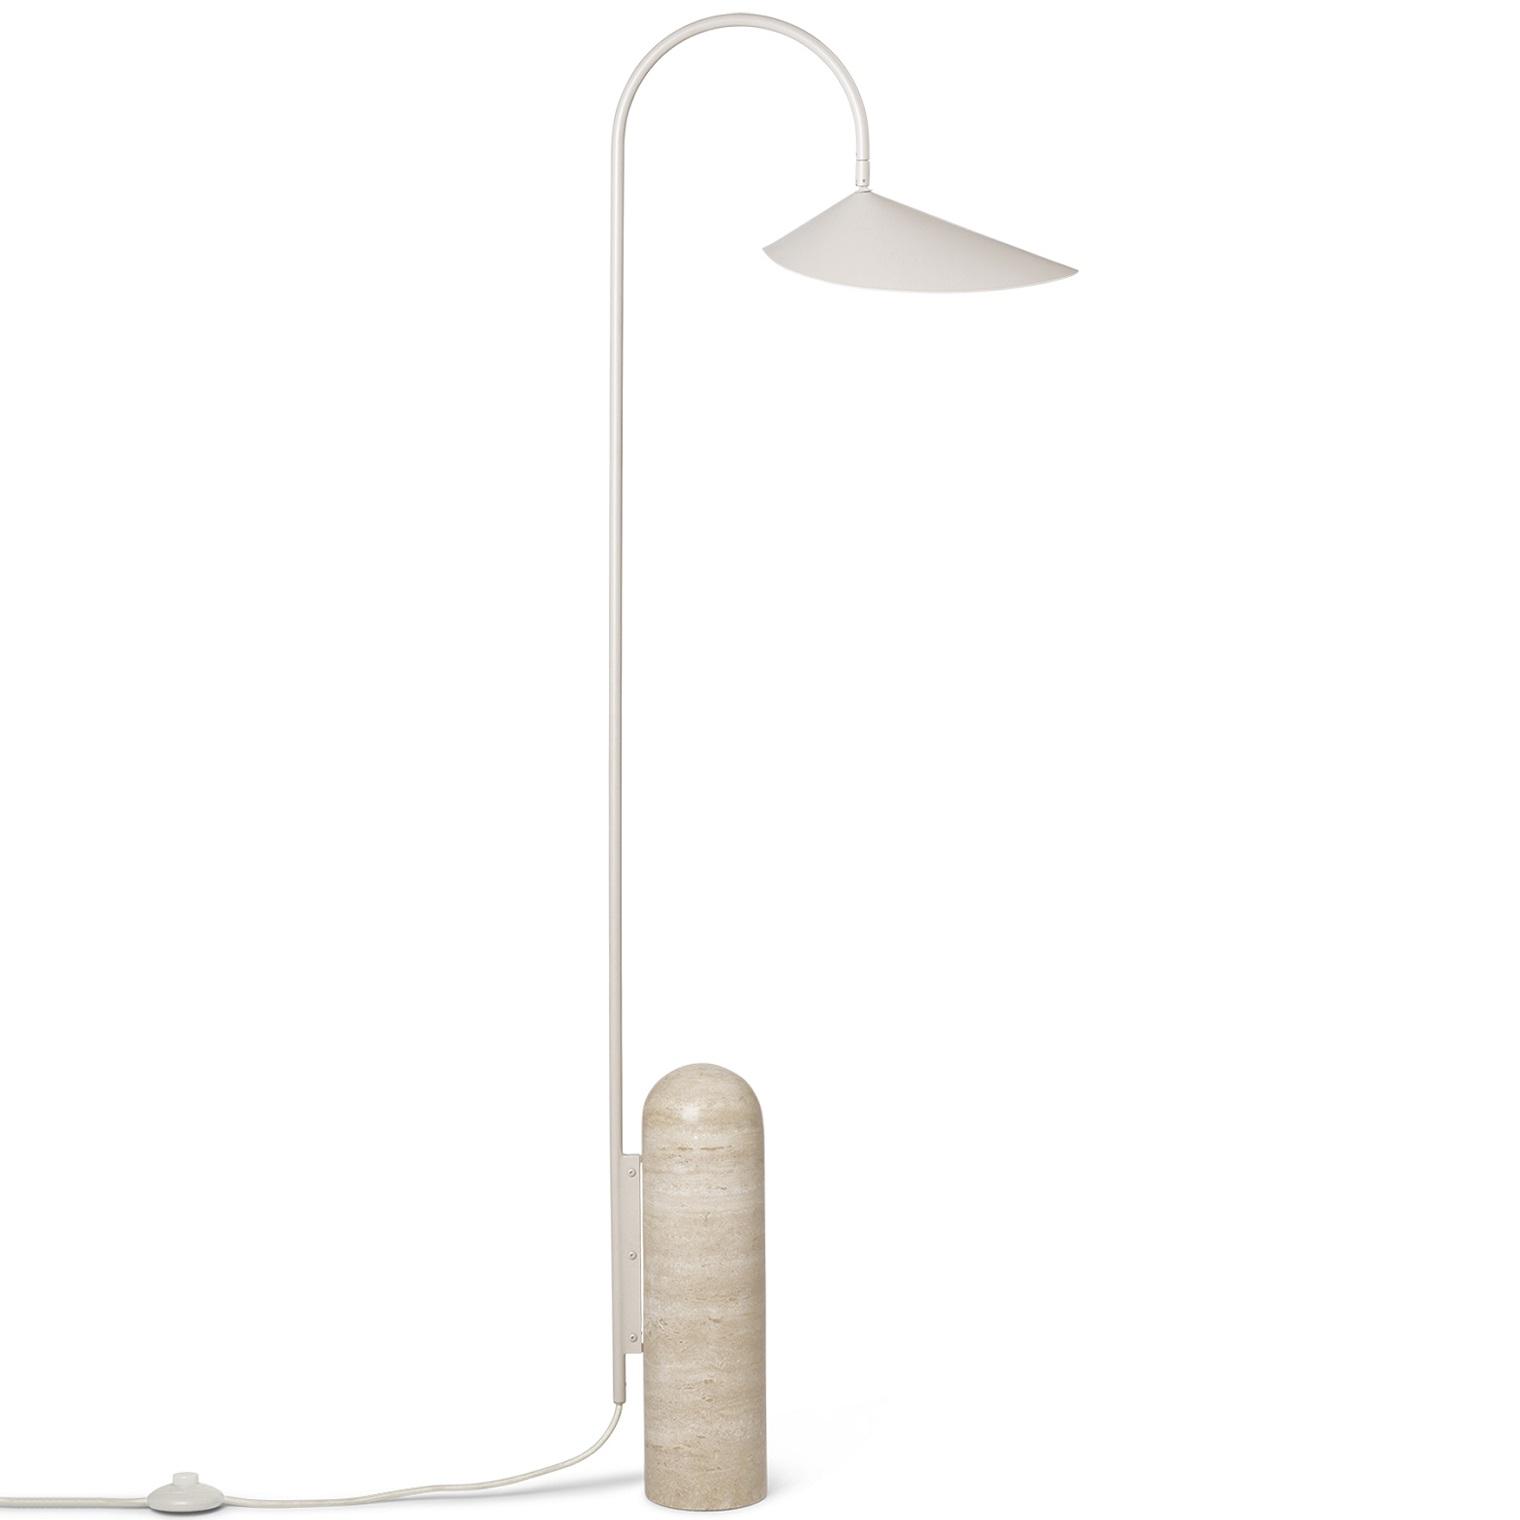 Ferm living designové stojací lampy Arum